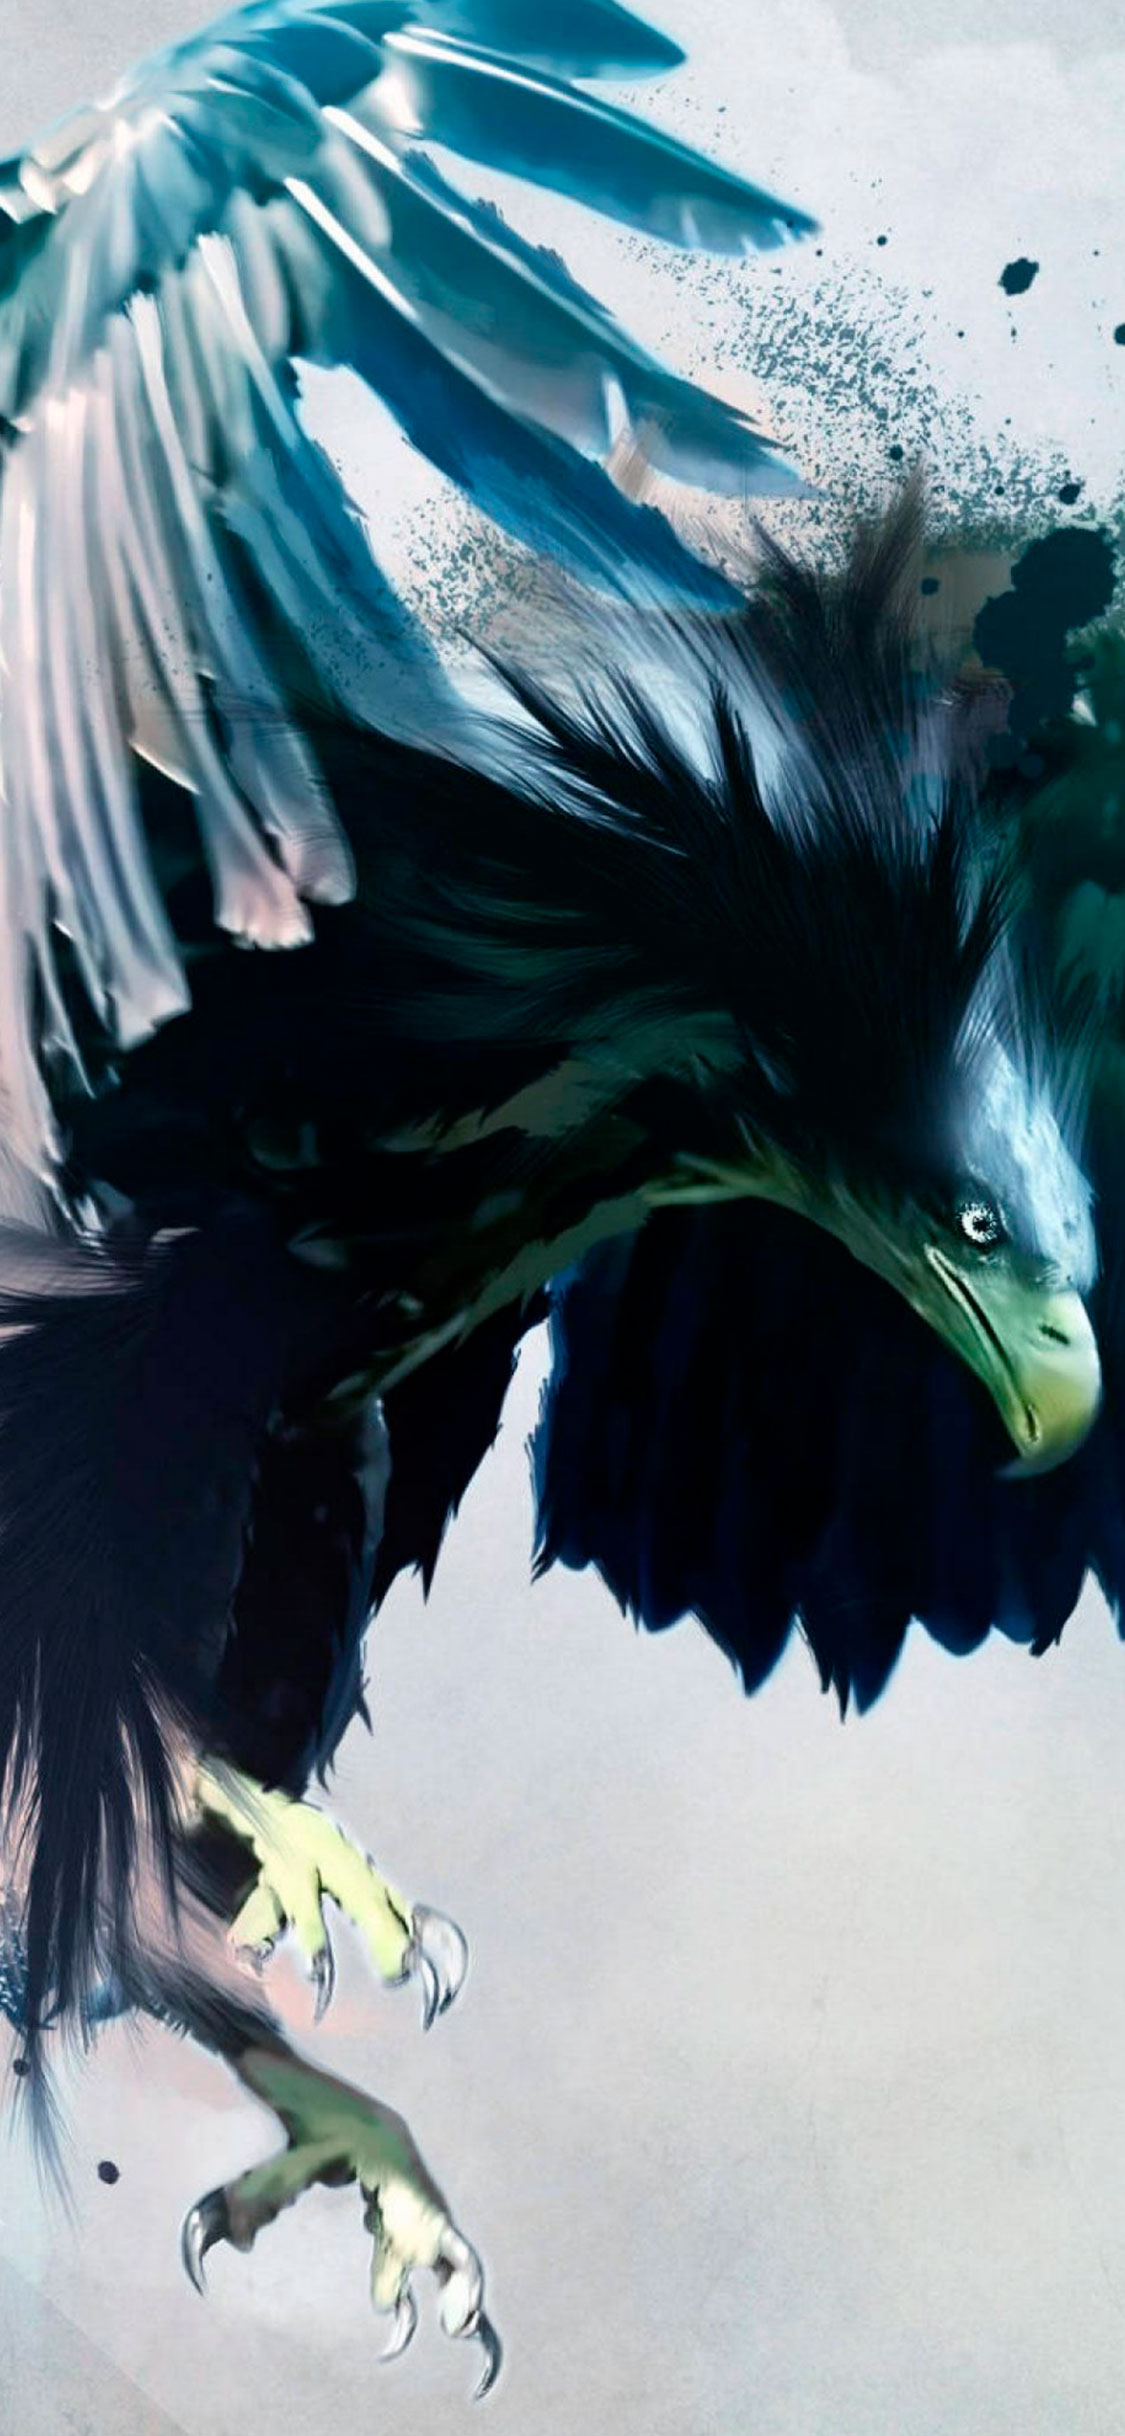 iPhone wallpaper eagle 3 Eagle